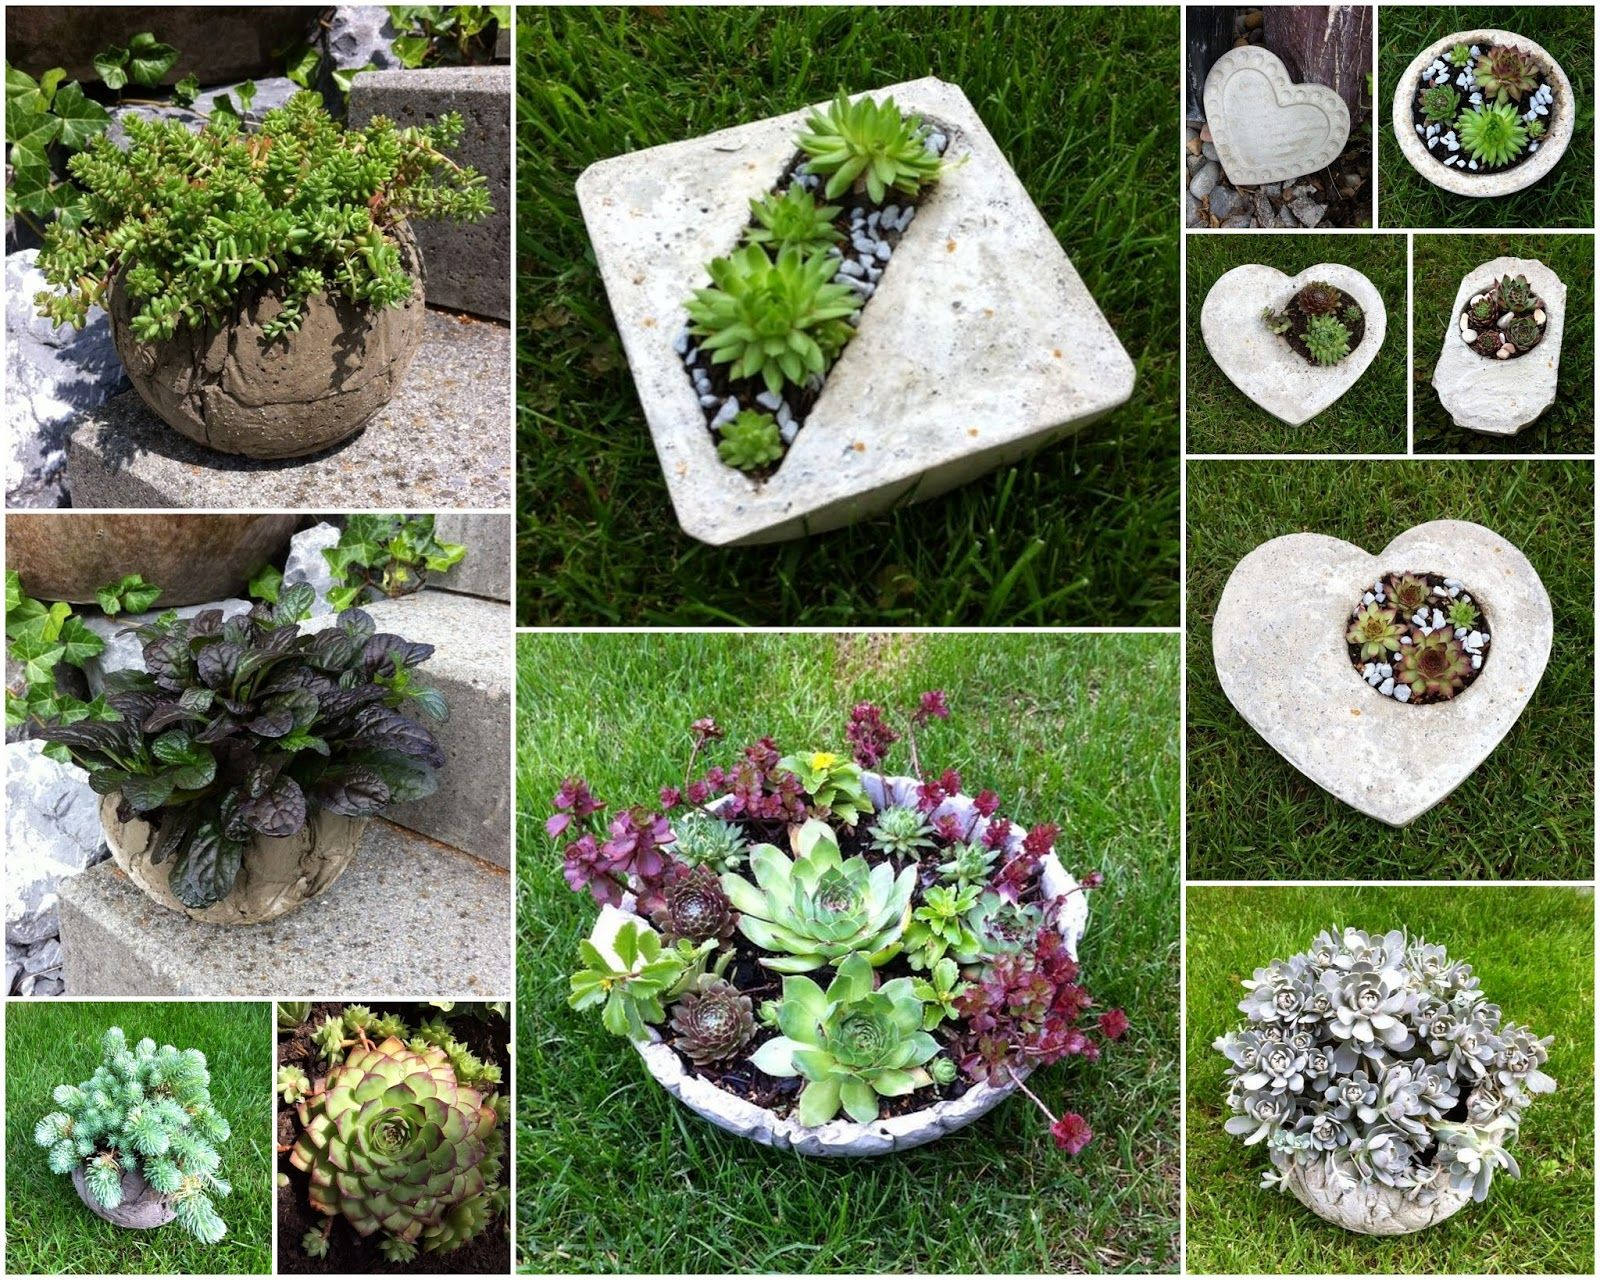 Kreative mitbringsel aus beton mit h bschen herbstzauber oder sch nem hauswurz garten - Garten bastelideen ...